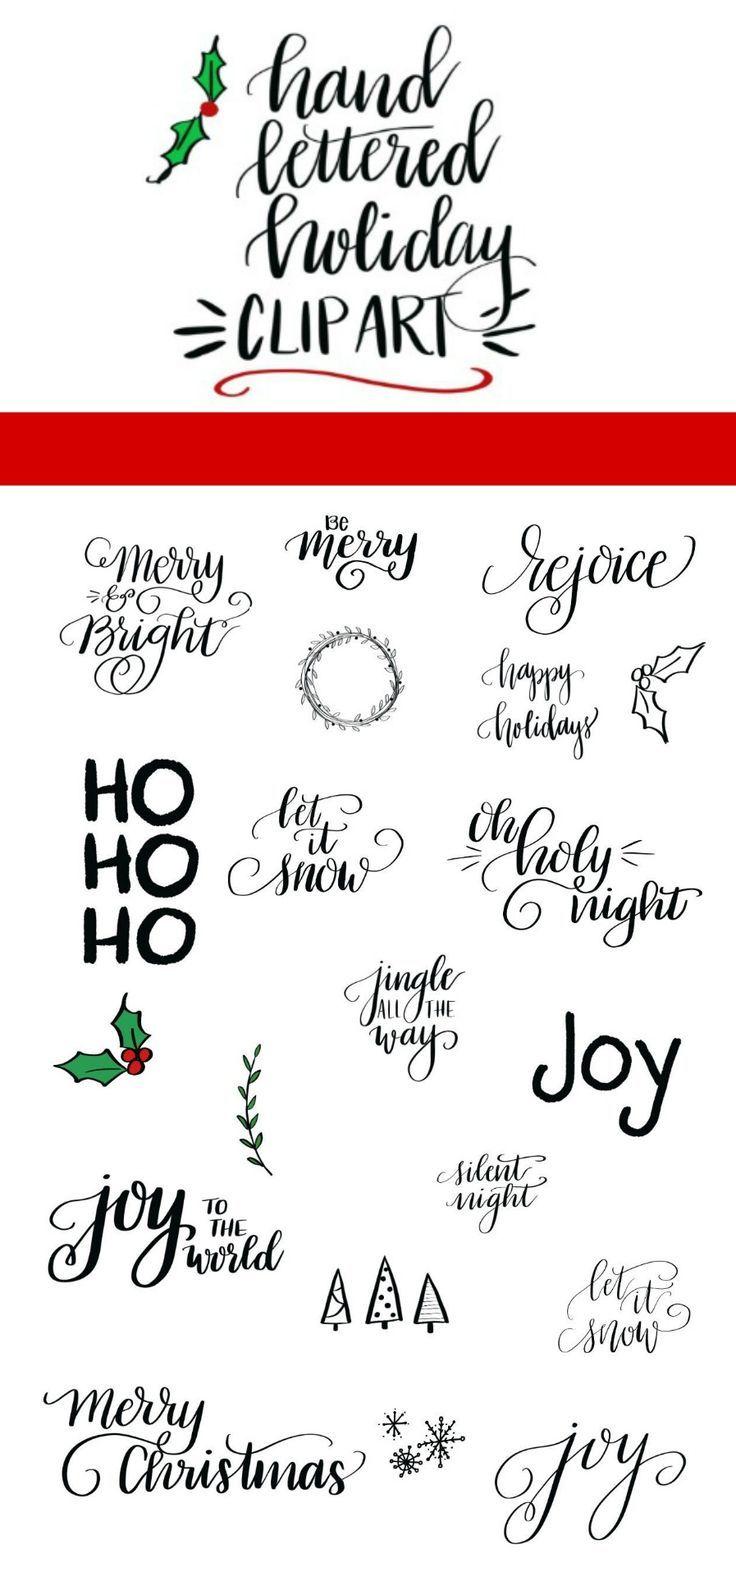 Hand Lettered Holiday Clip Art Release | Lettering | Pinterest ...